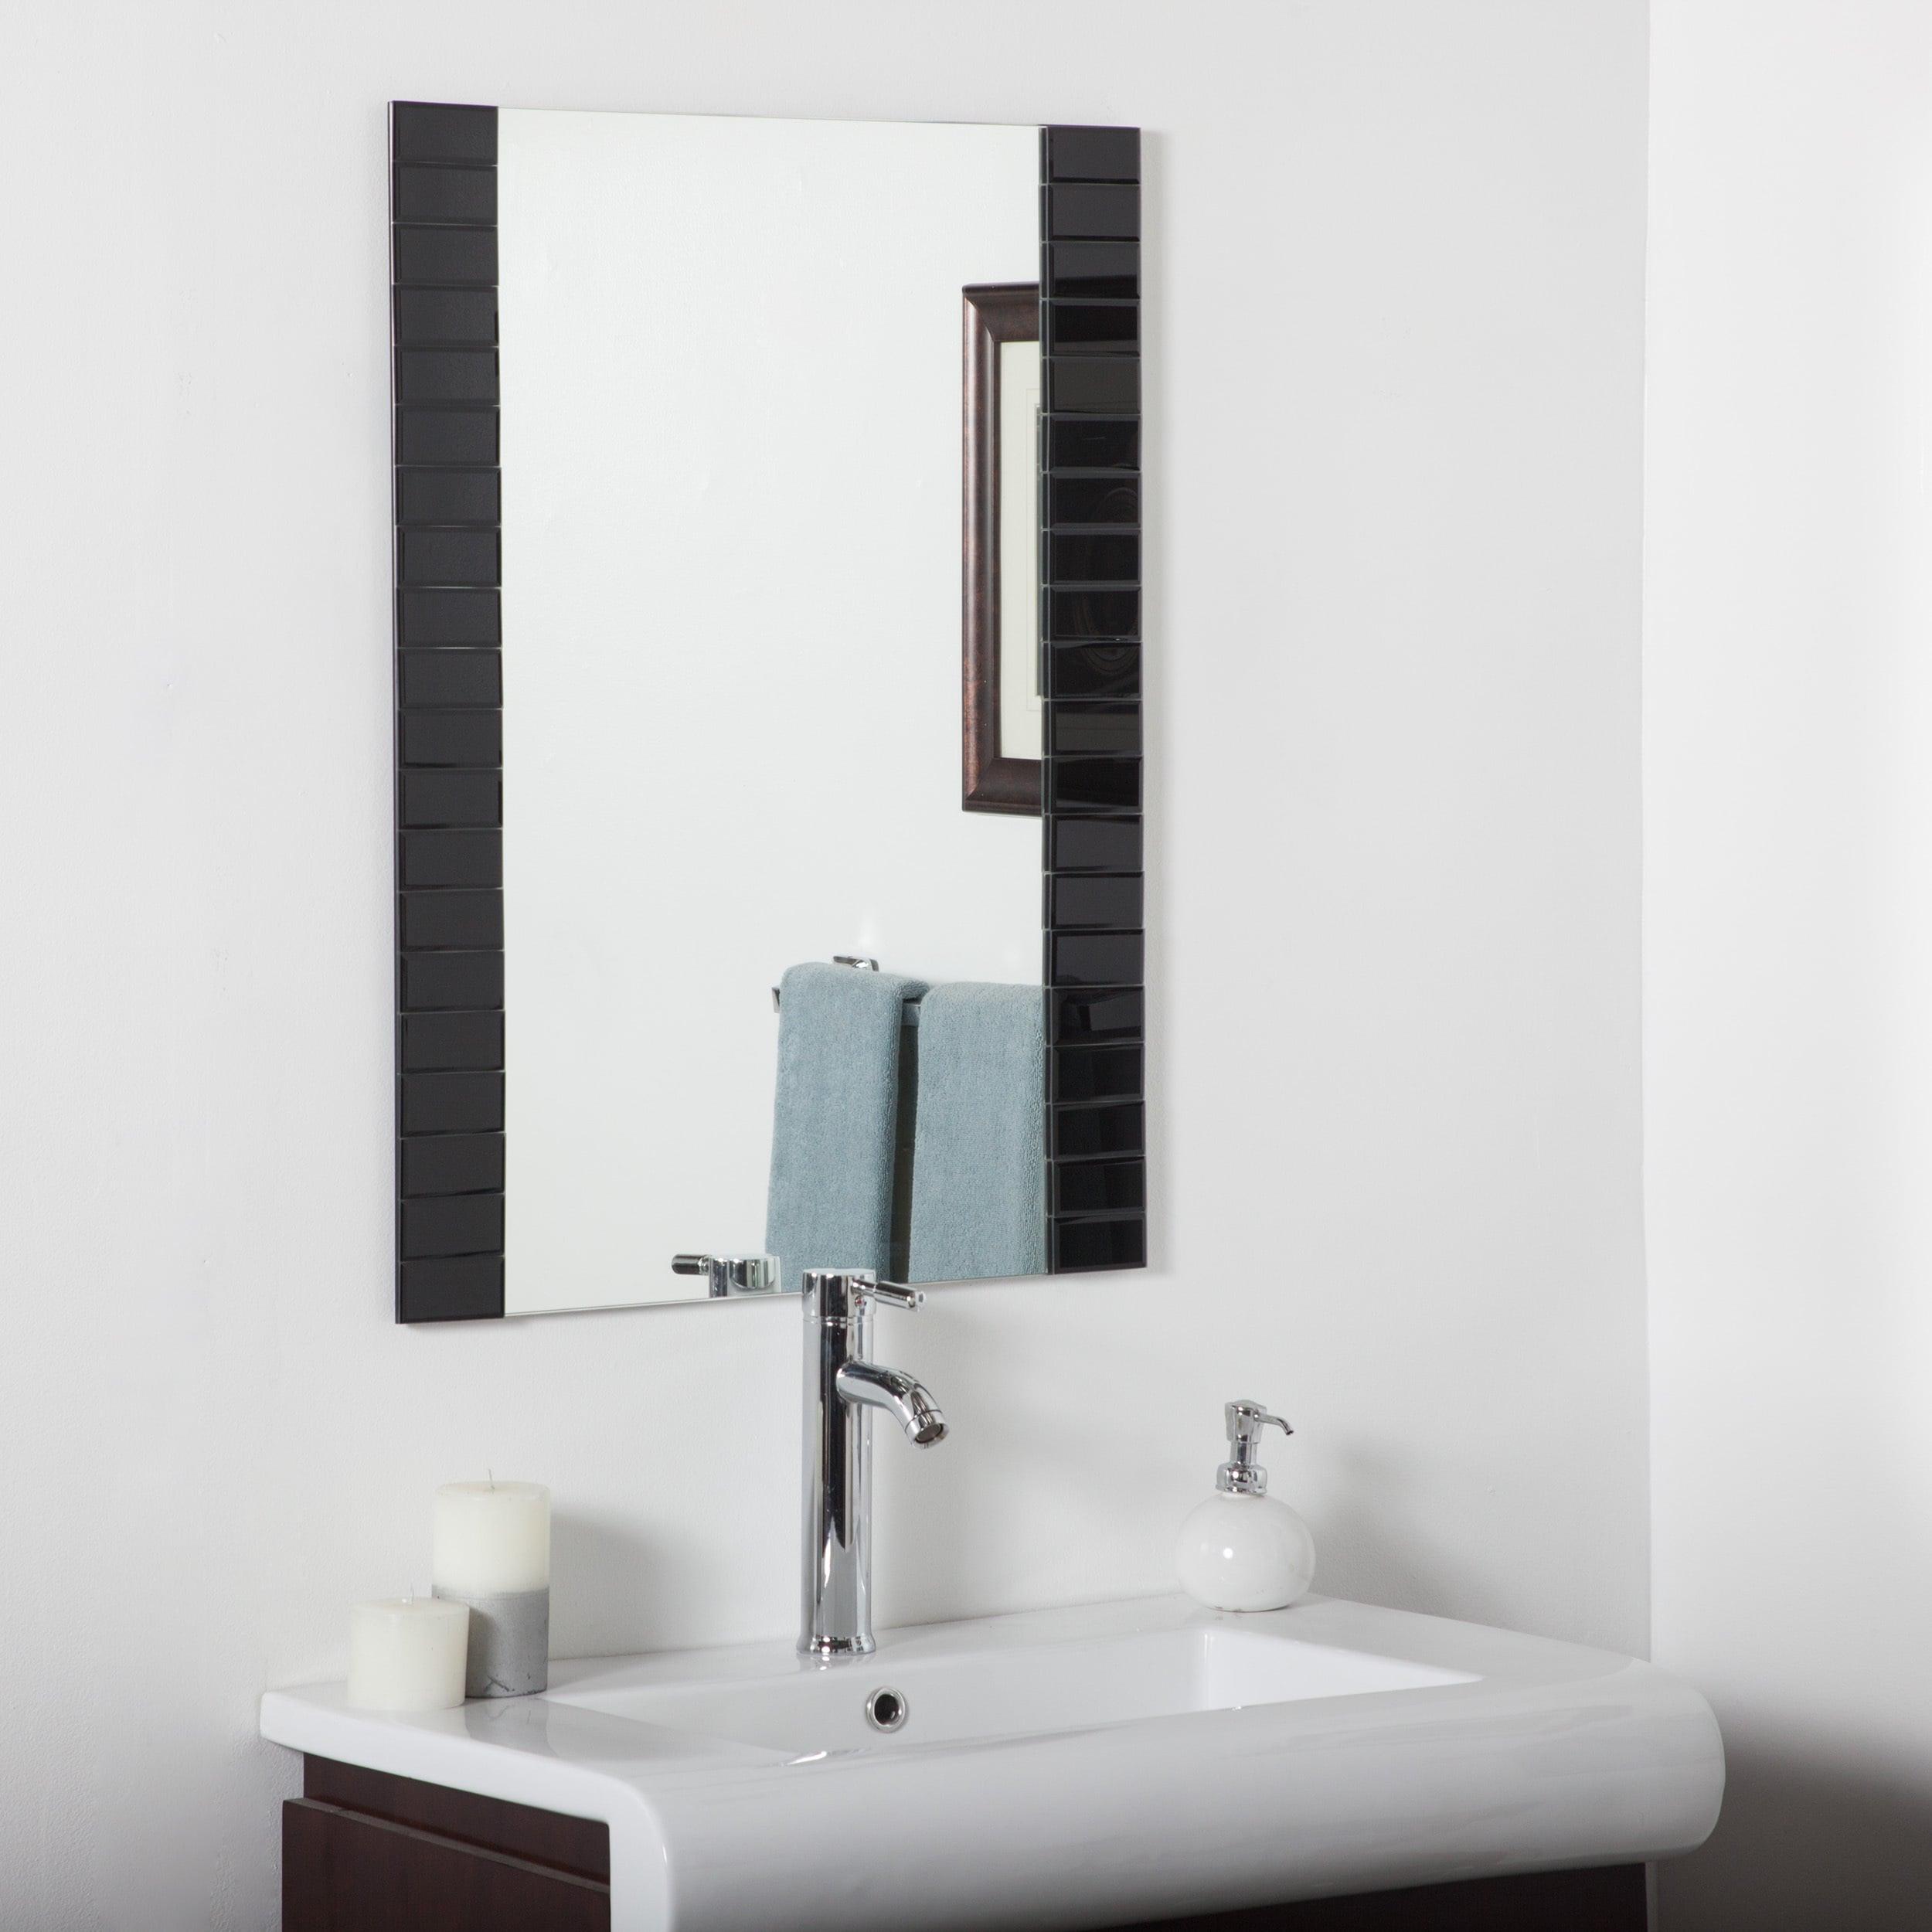 Unframed Mirrors For Less | Overstock